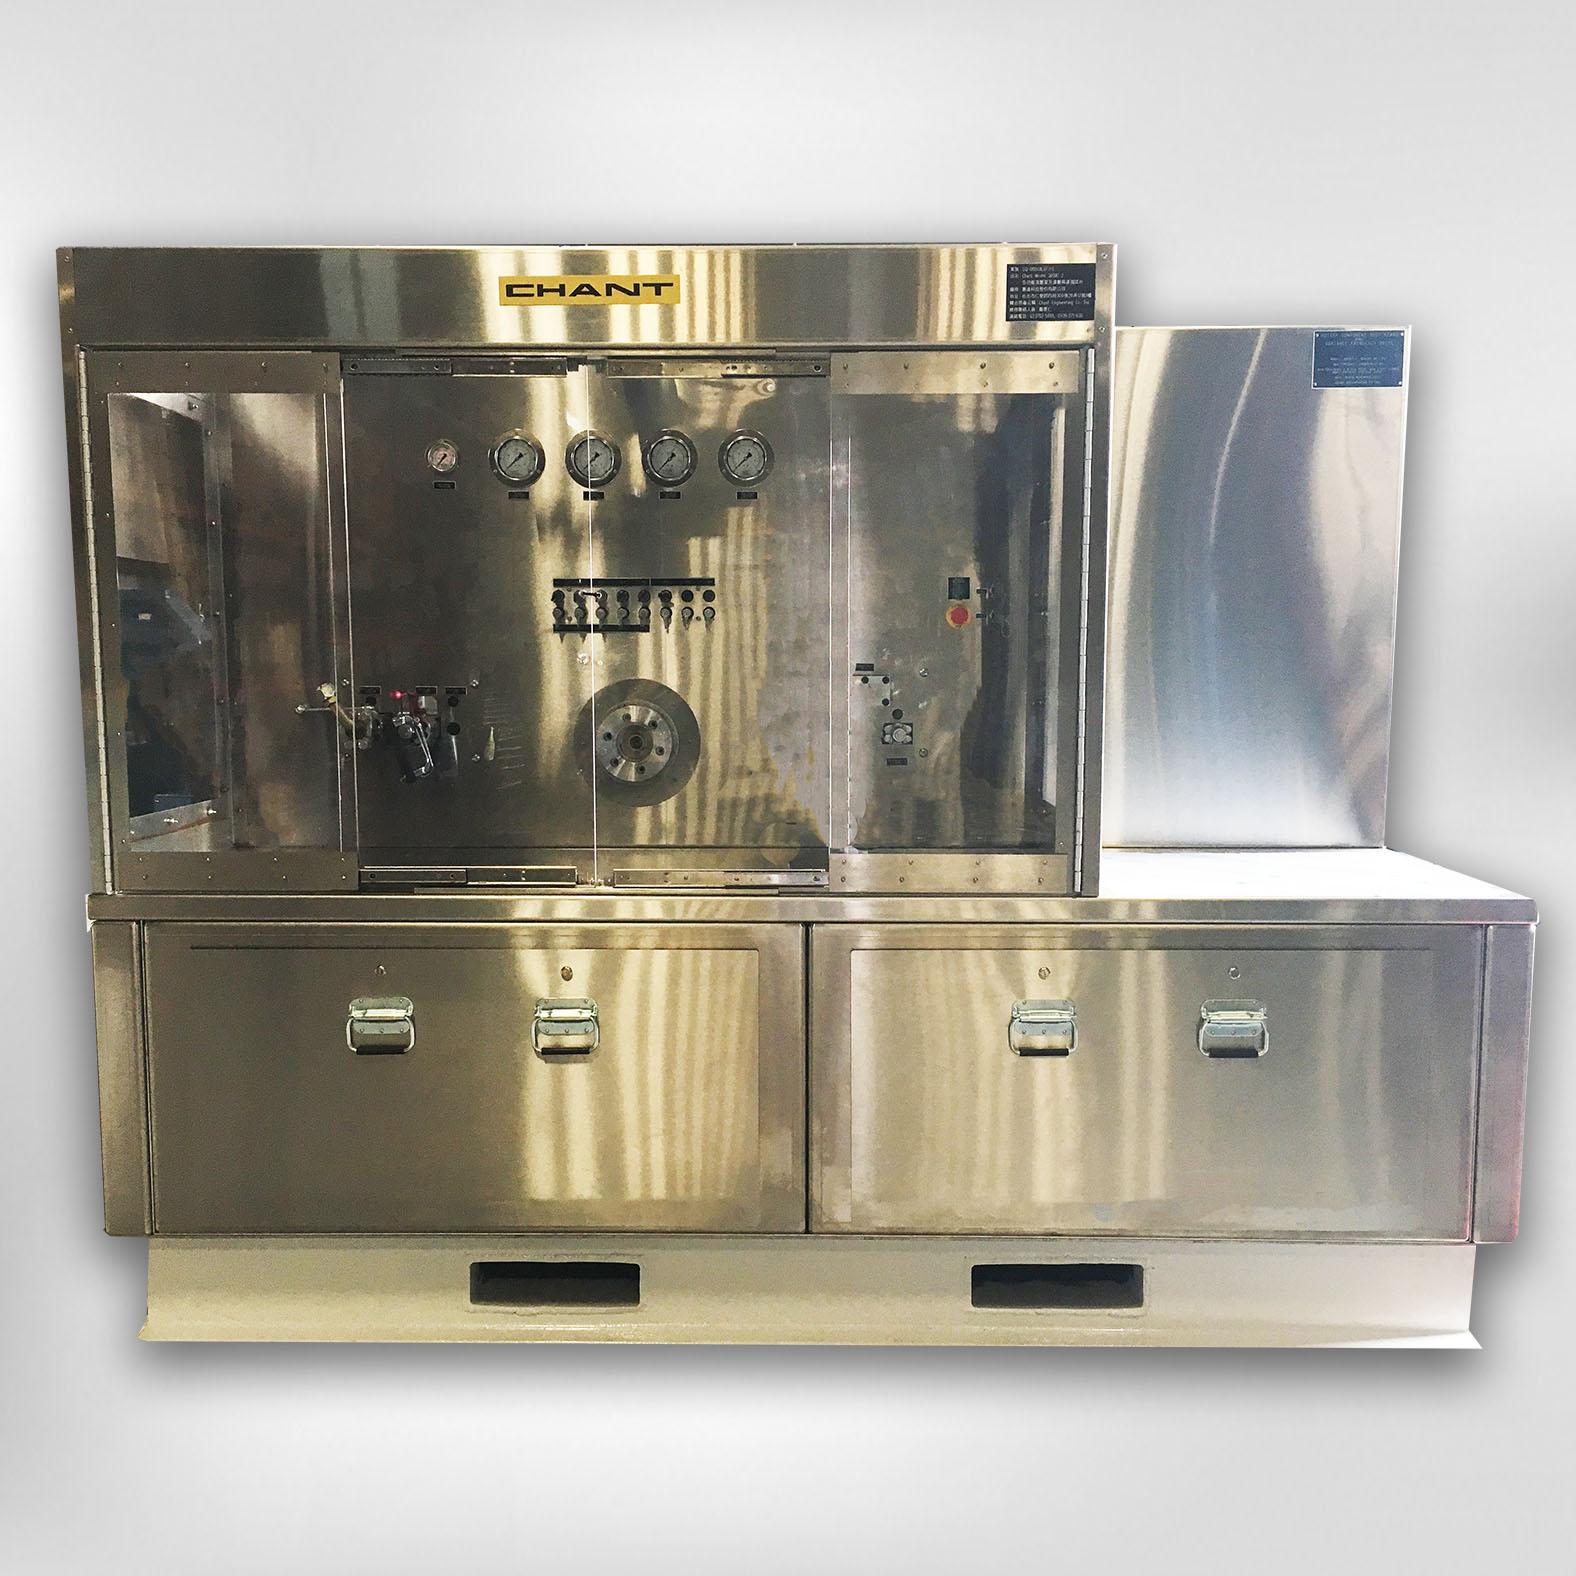 30387 Servo-Linear Component Test Stand